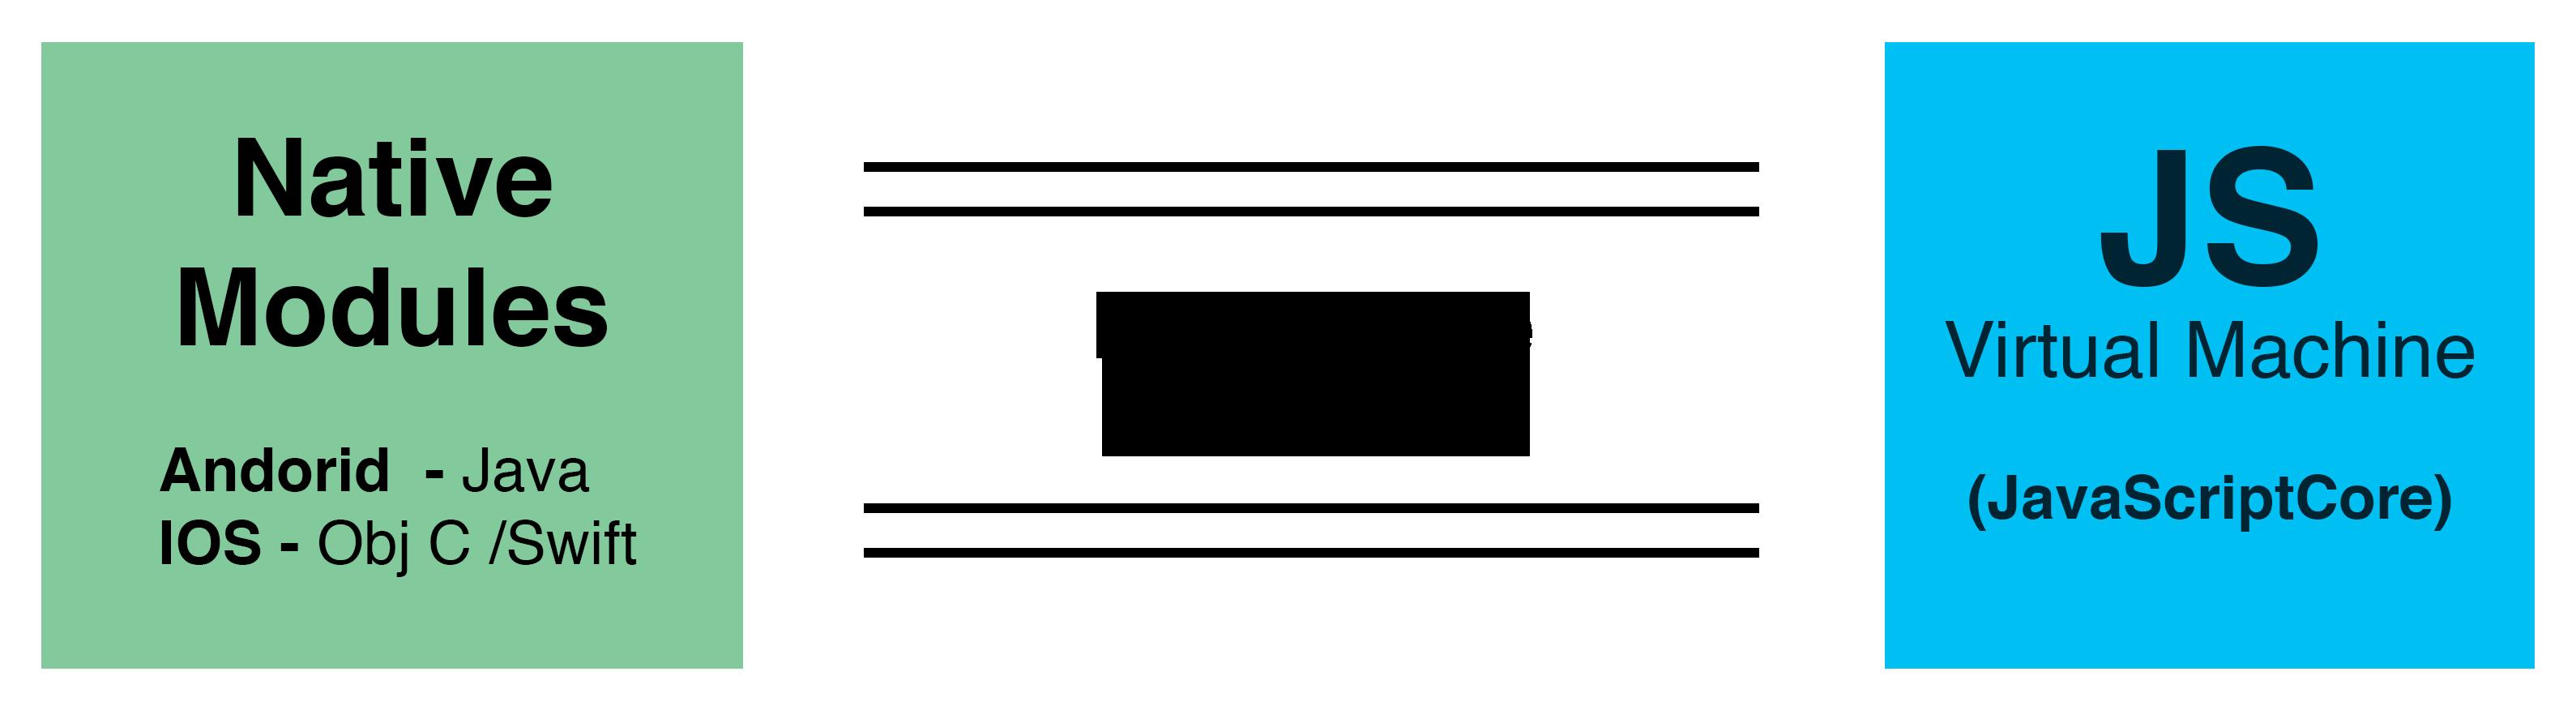 Kivy. Xamarin. React Native. Три фреймворка — один эксперимент (часть 3) - 3